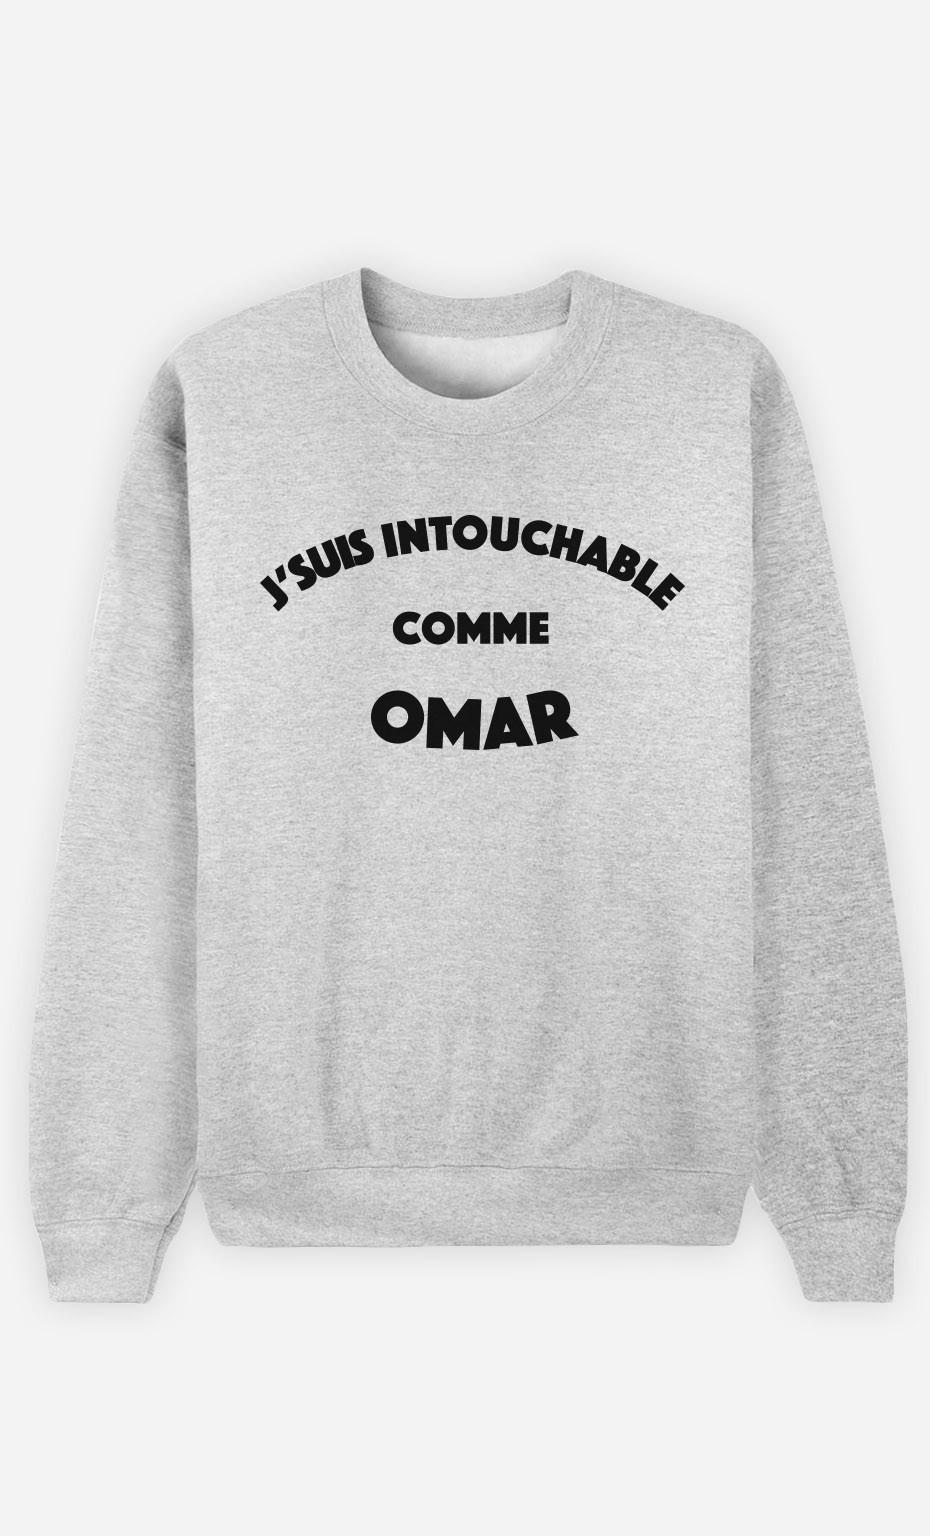 Sweat J'suis Intouchable comme Omar